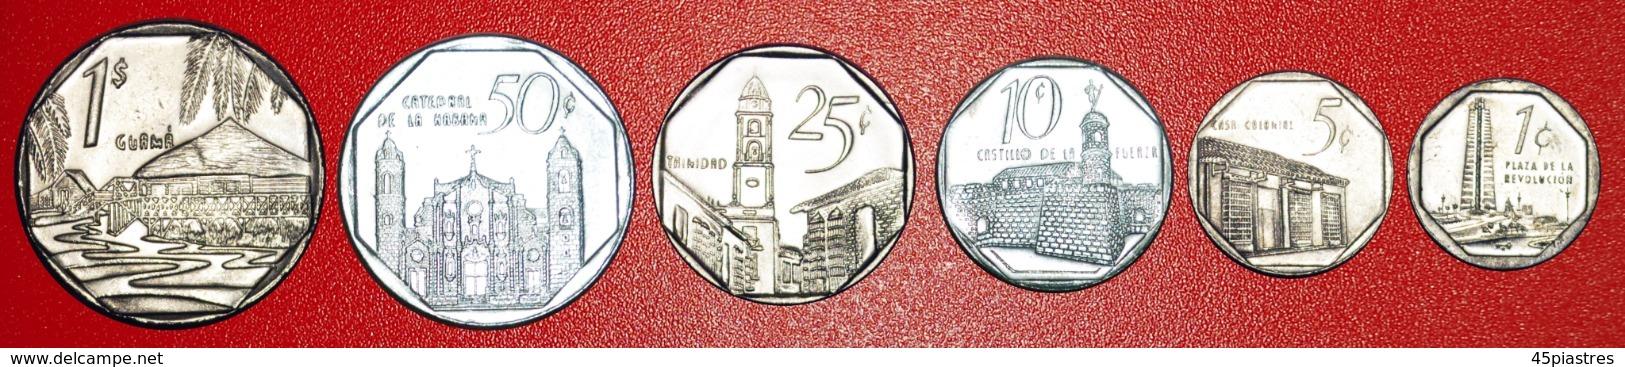 + COMPLETE EMISSION SET CONVERTIBLE PESO: CUBA ★ 1-5-10-25-50 CENTAVOS — 1 PESO 2000-2008!  LOW START ★ NO RESERVE! - Munten & Bankbiljetten